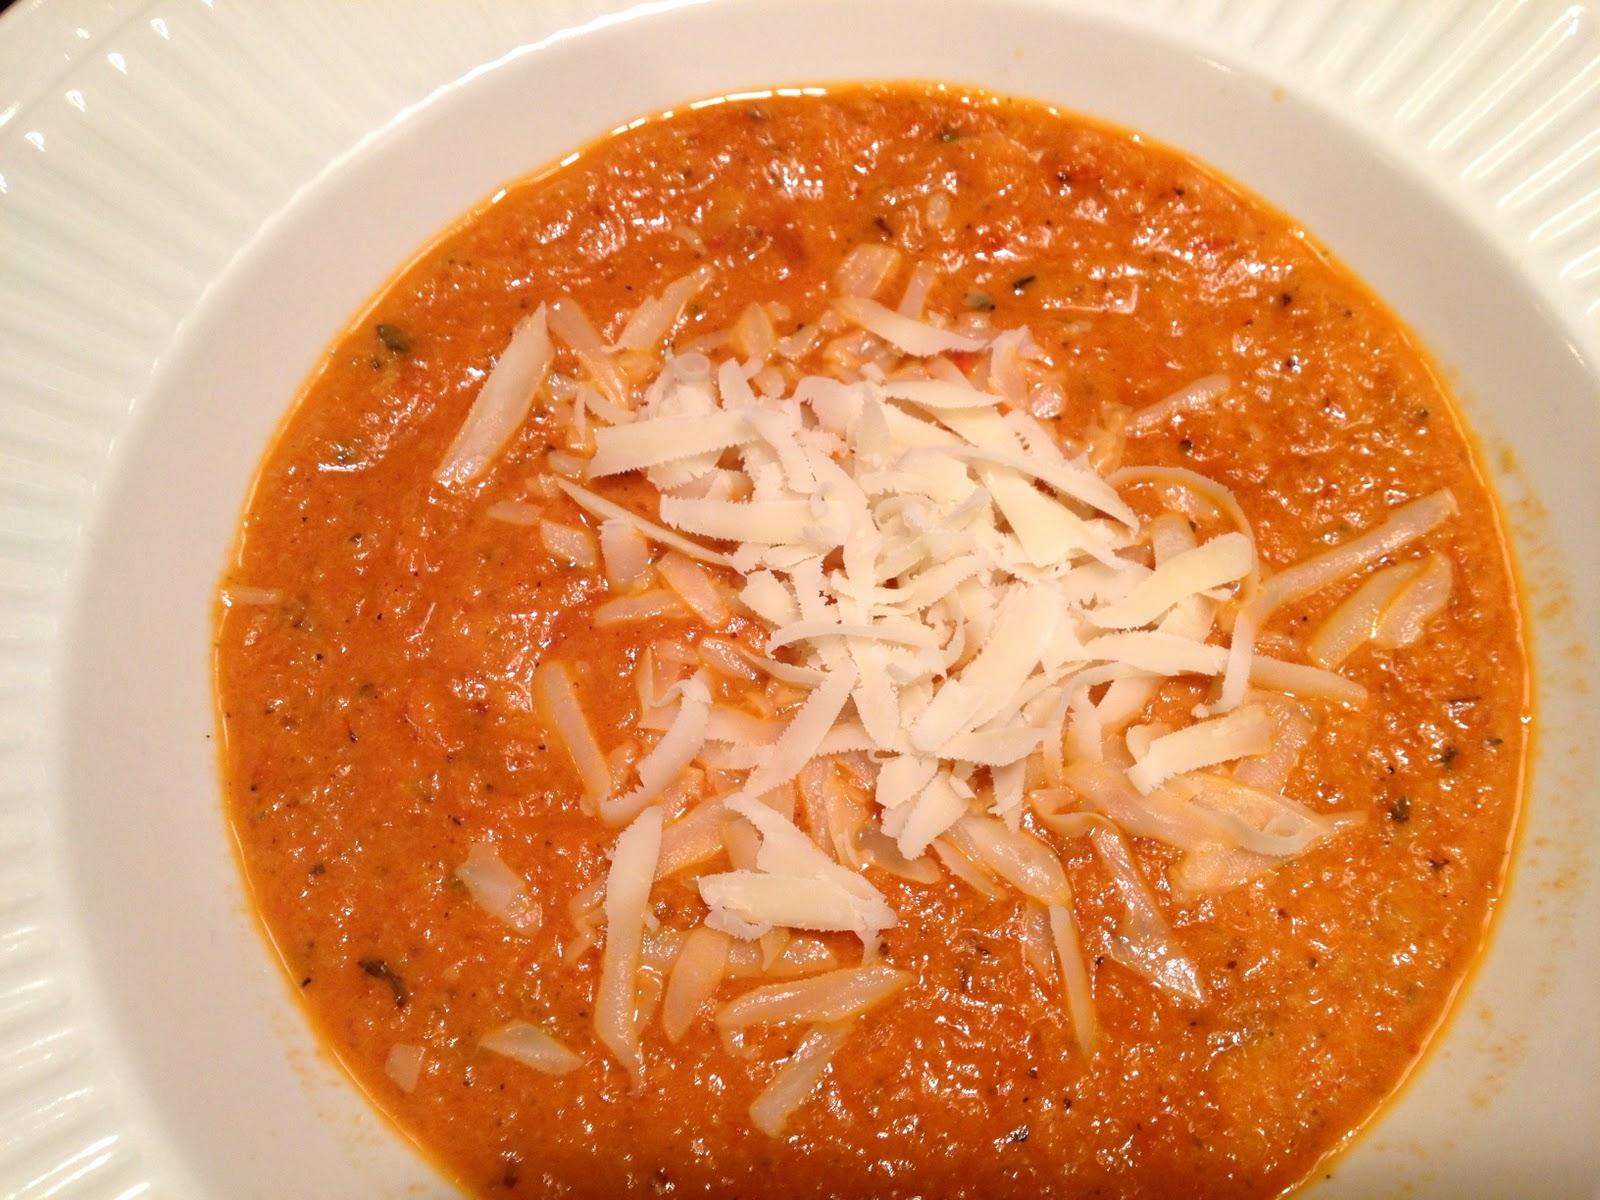 Call Me Mrs. Rapp: Tomato Artichoke Soup